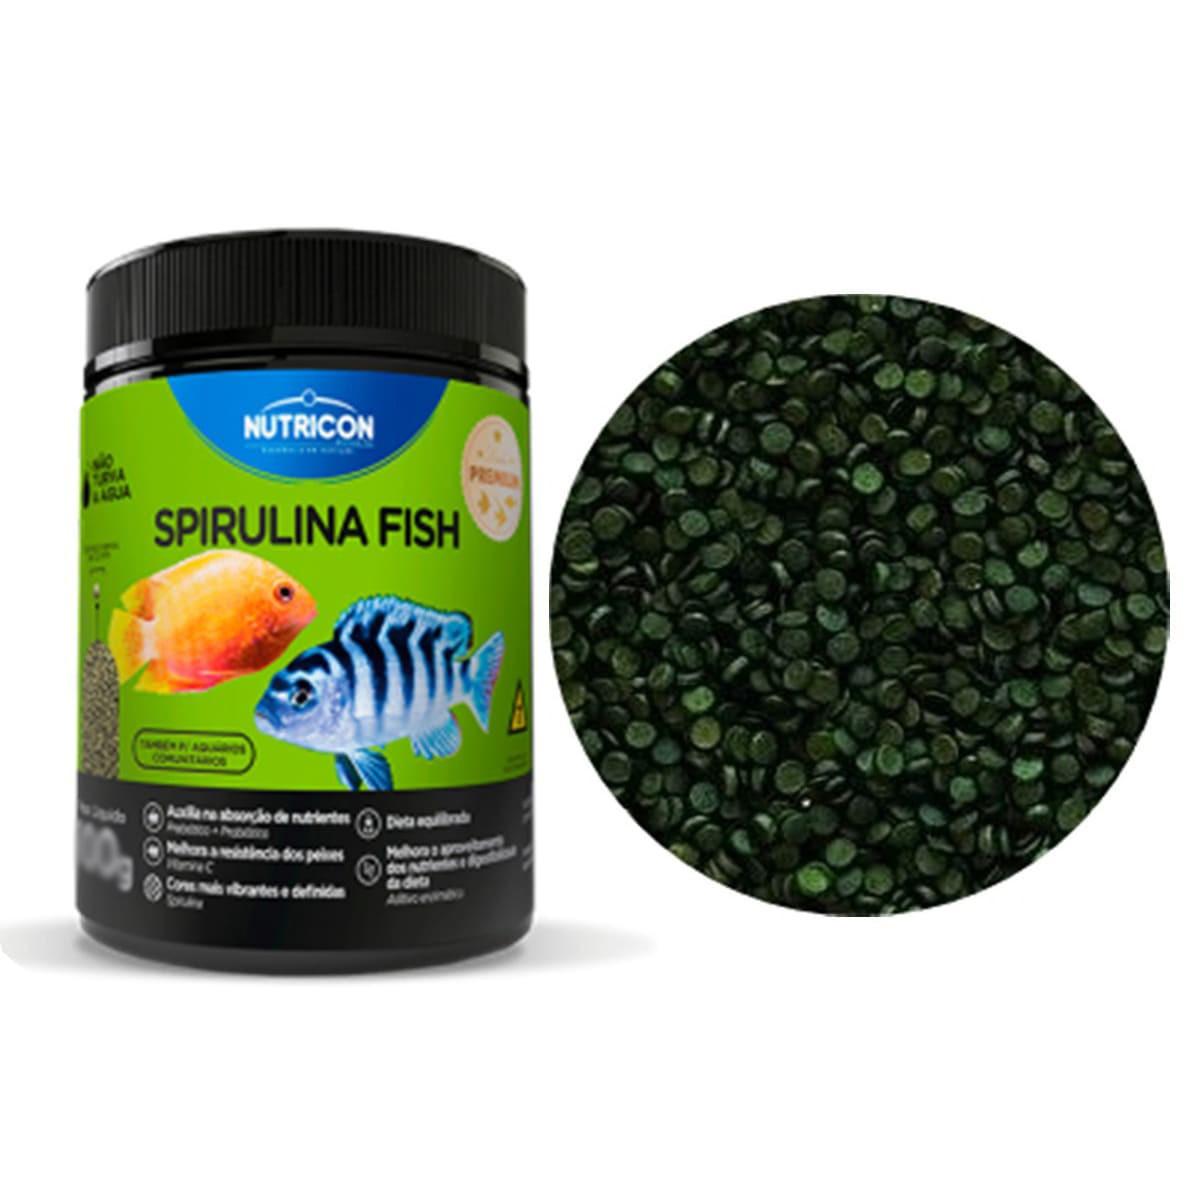 Ração Nutricon Marinhos 160g + Nutricon Spirulina Fish 100g